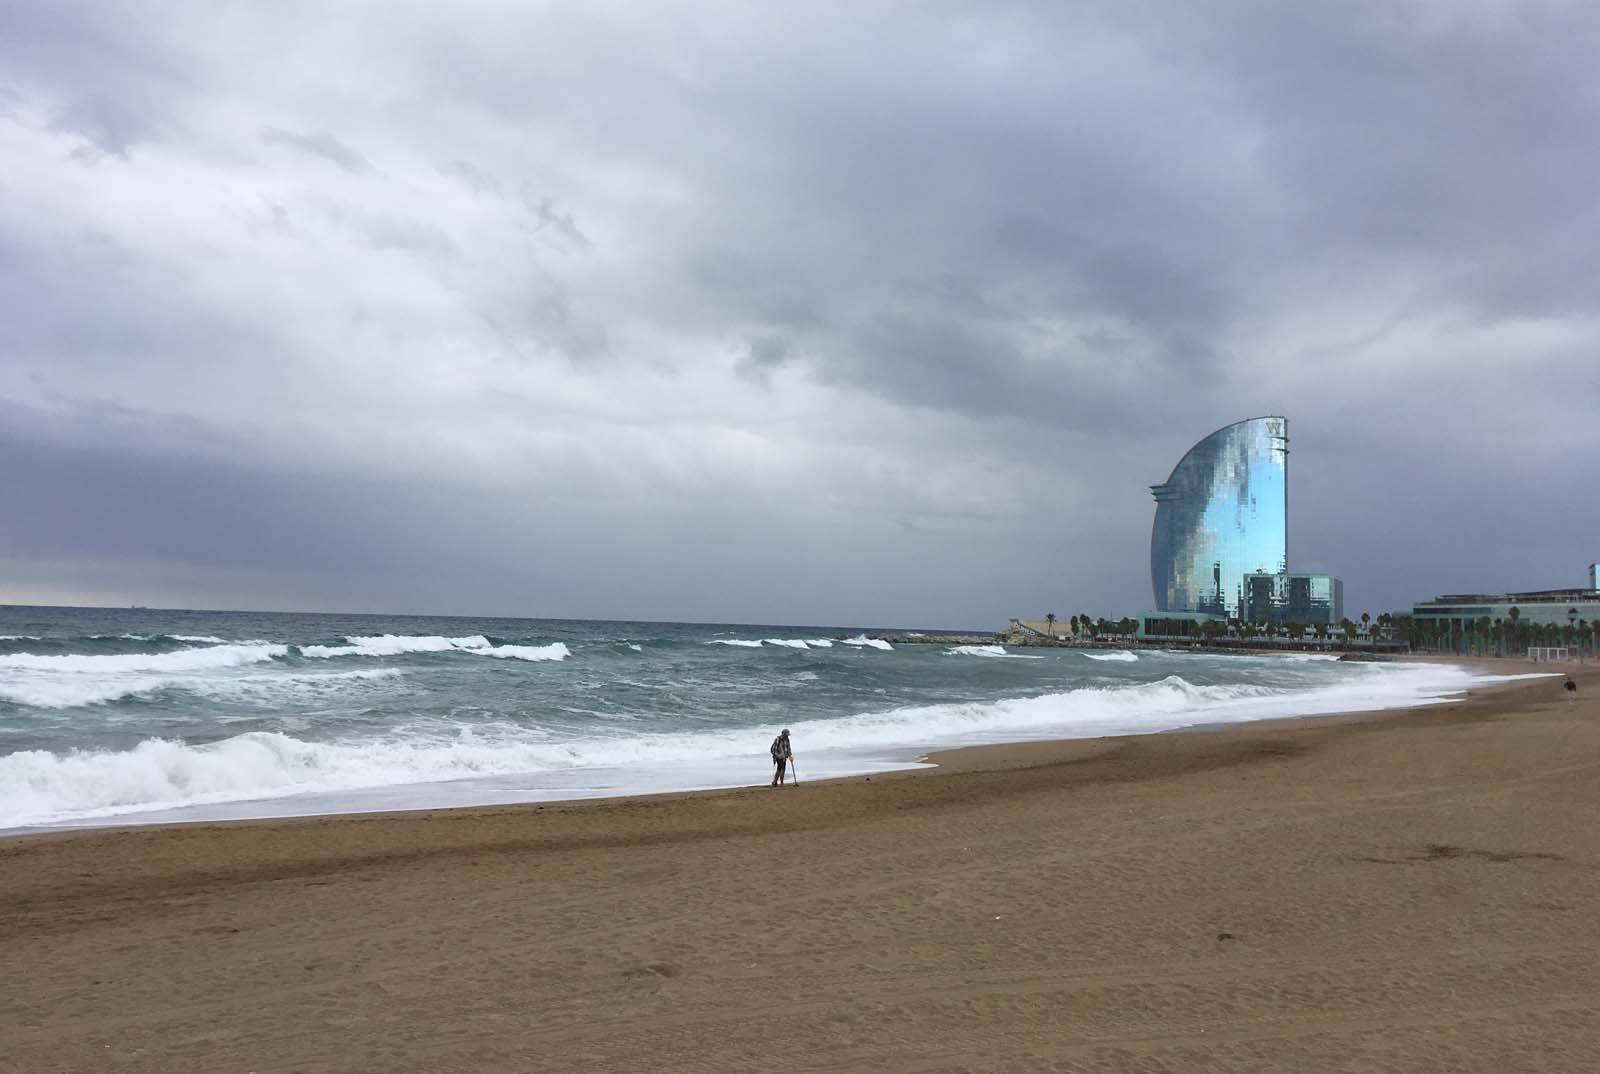 Playa de la Barceloneta. Otoño 2018